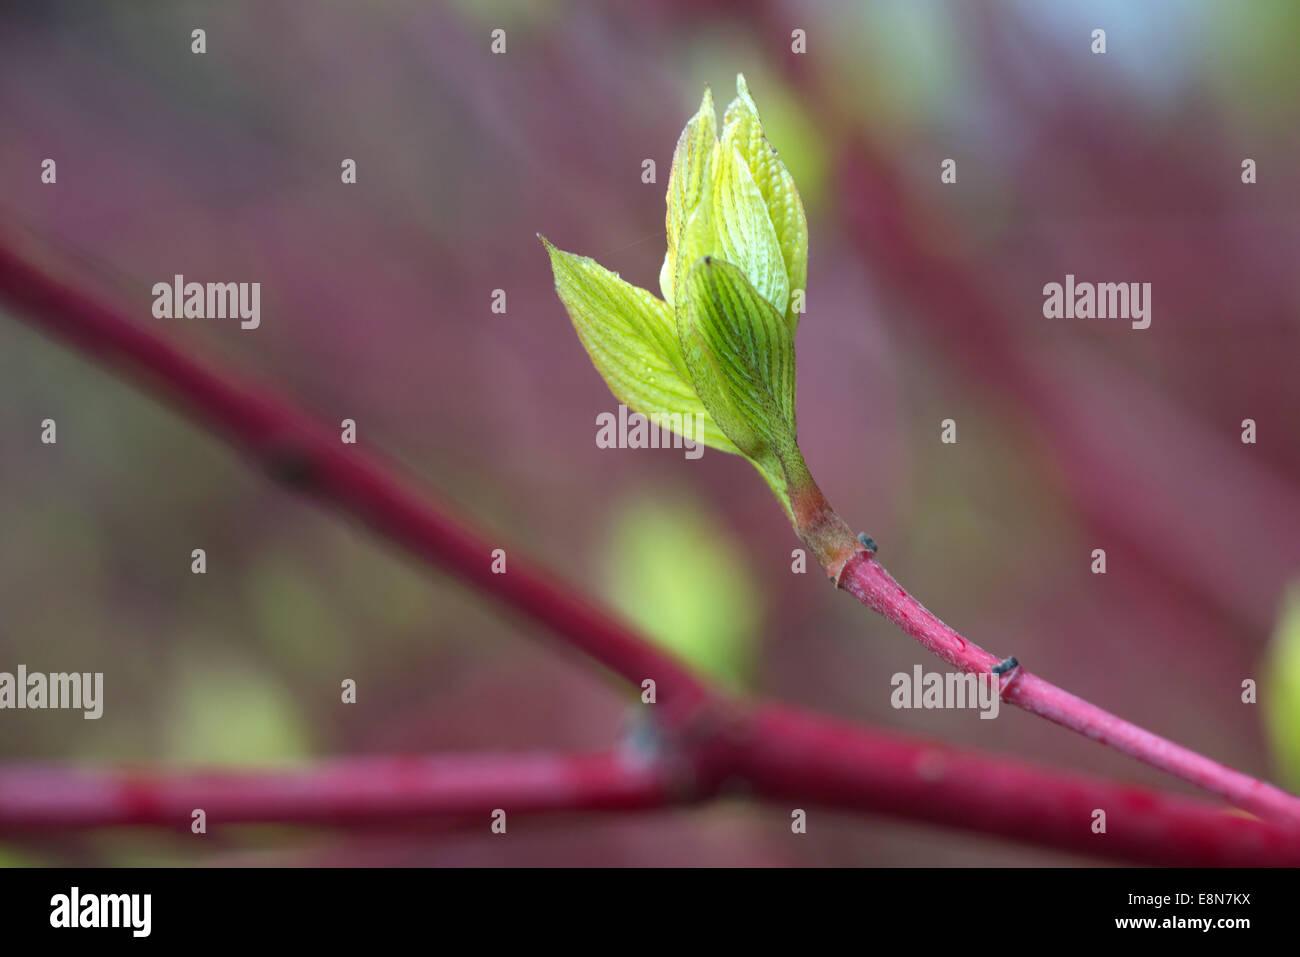 Red twig Dogwood bush growing in Brighton. - Stock Image